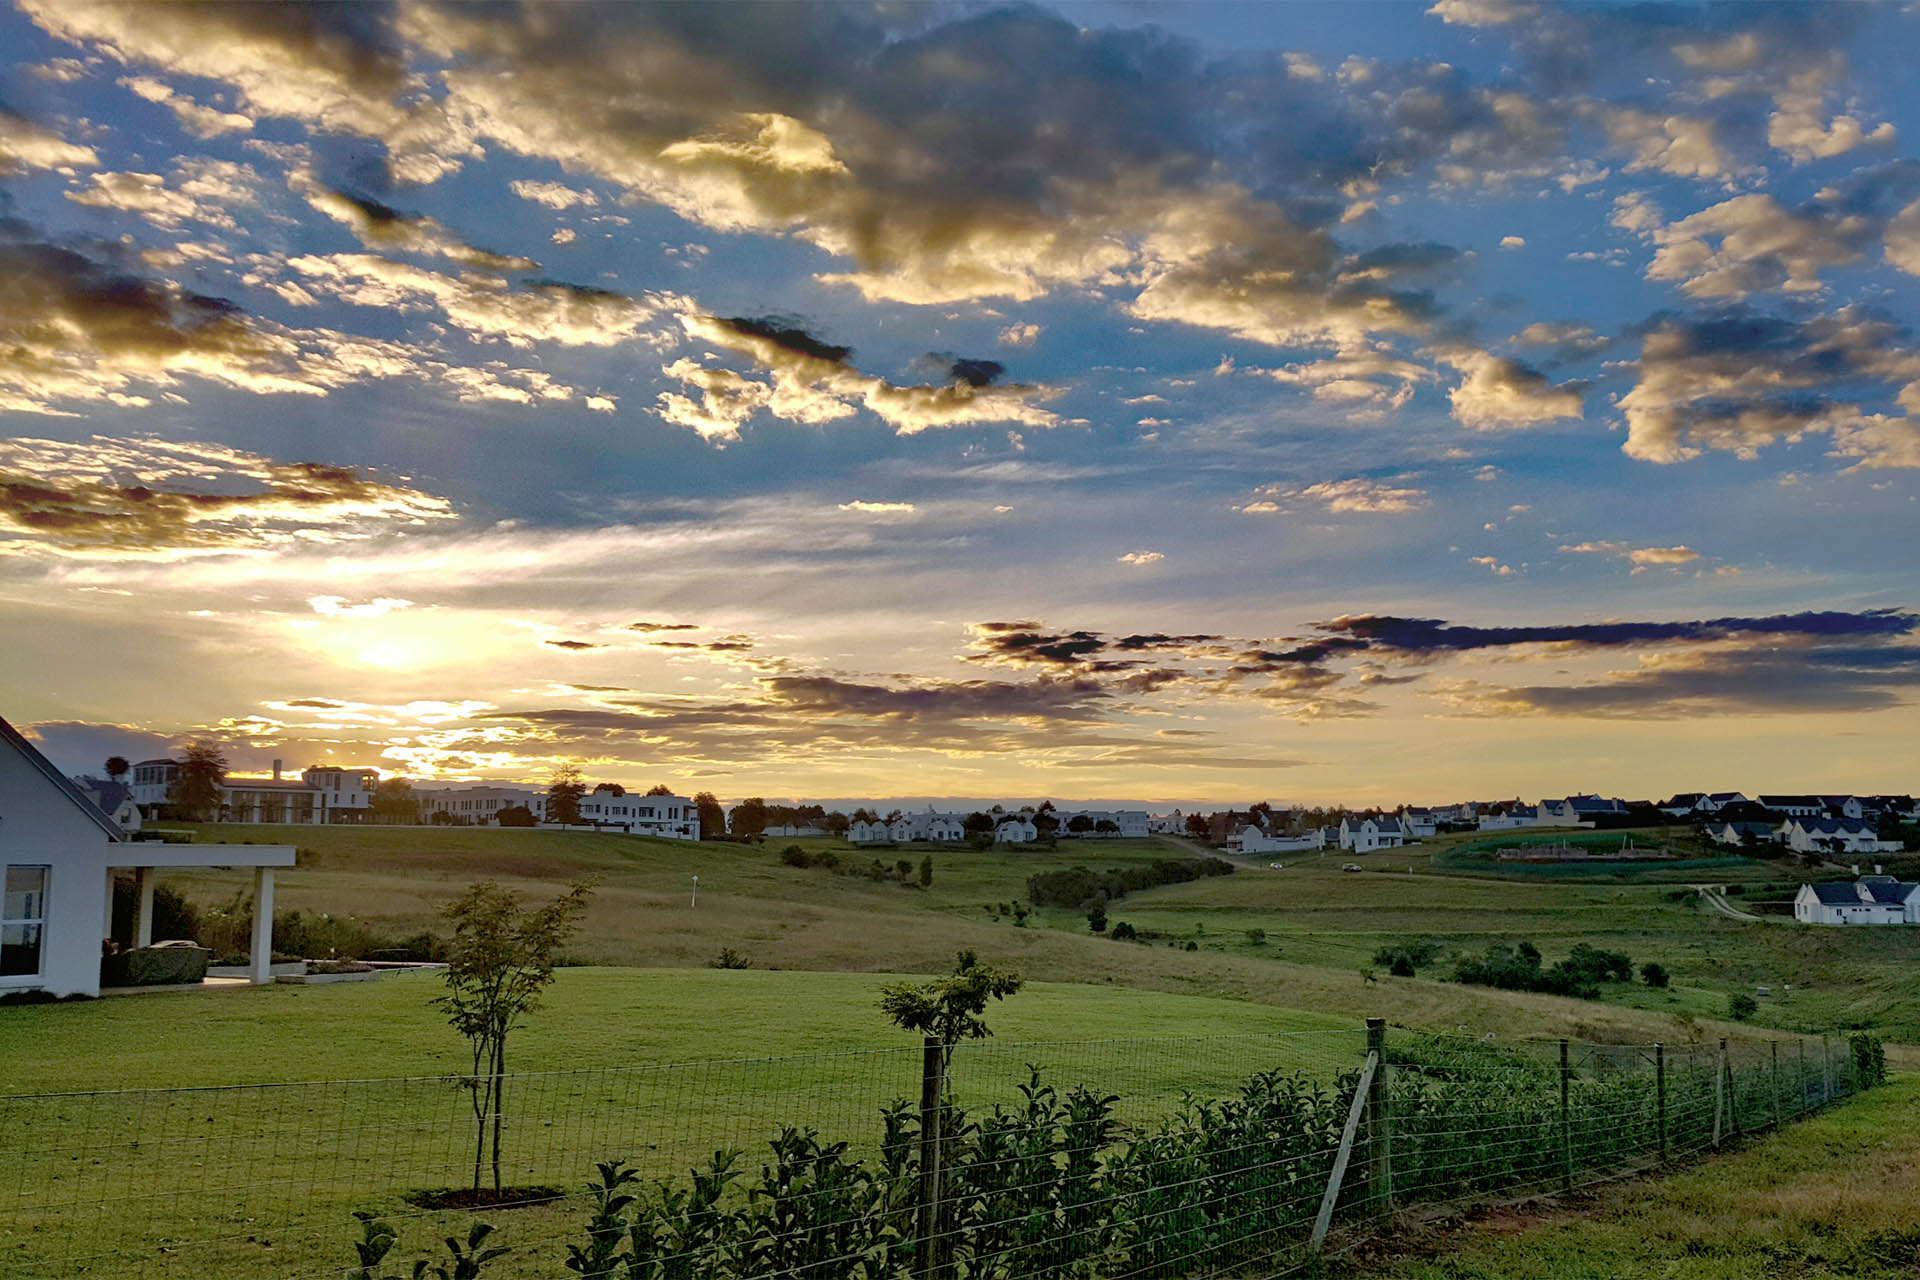 amenities-salon-garlington-estate-luxury-country-development-hilton-kzn-midlands-countryside